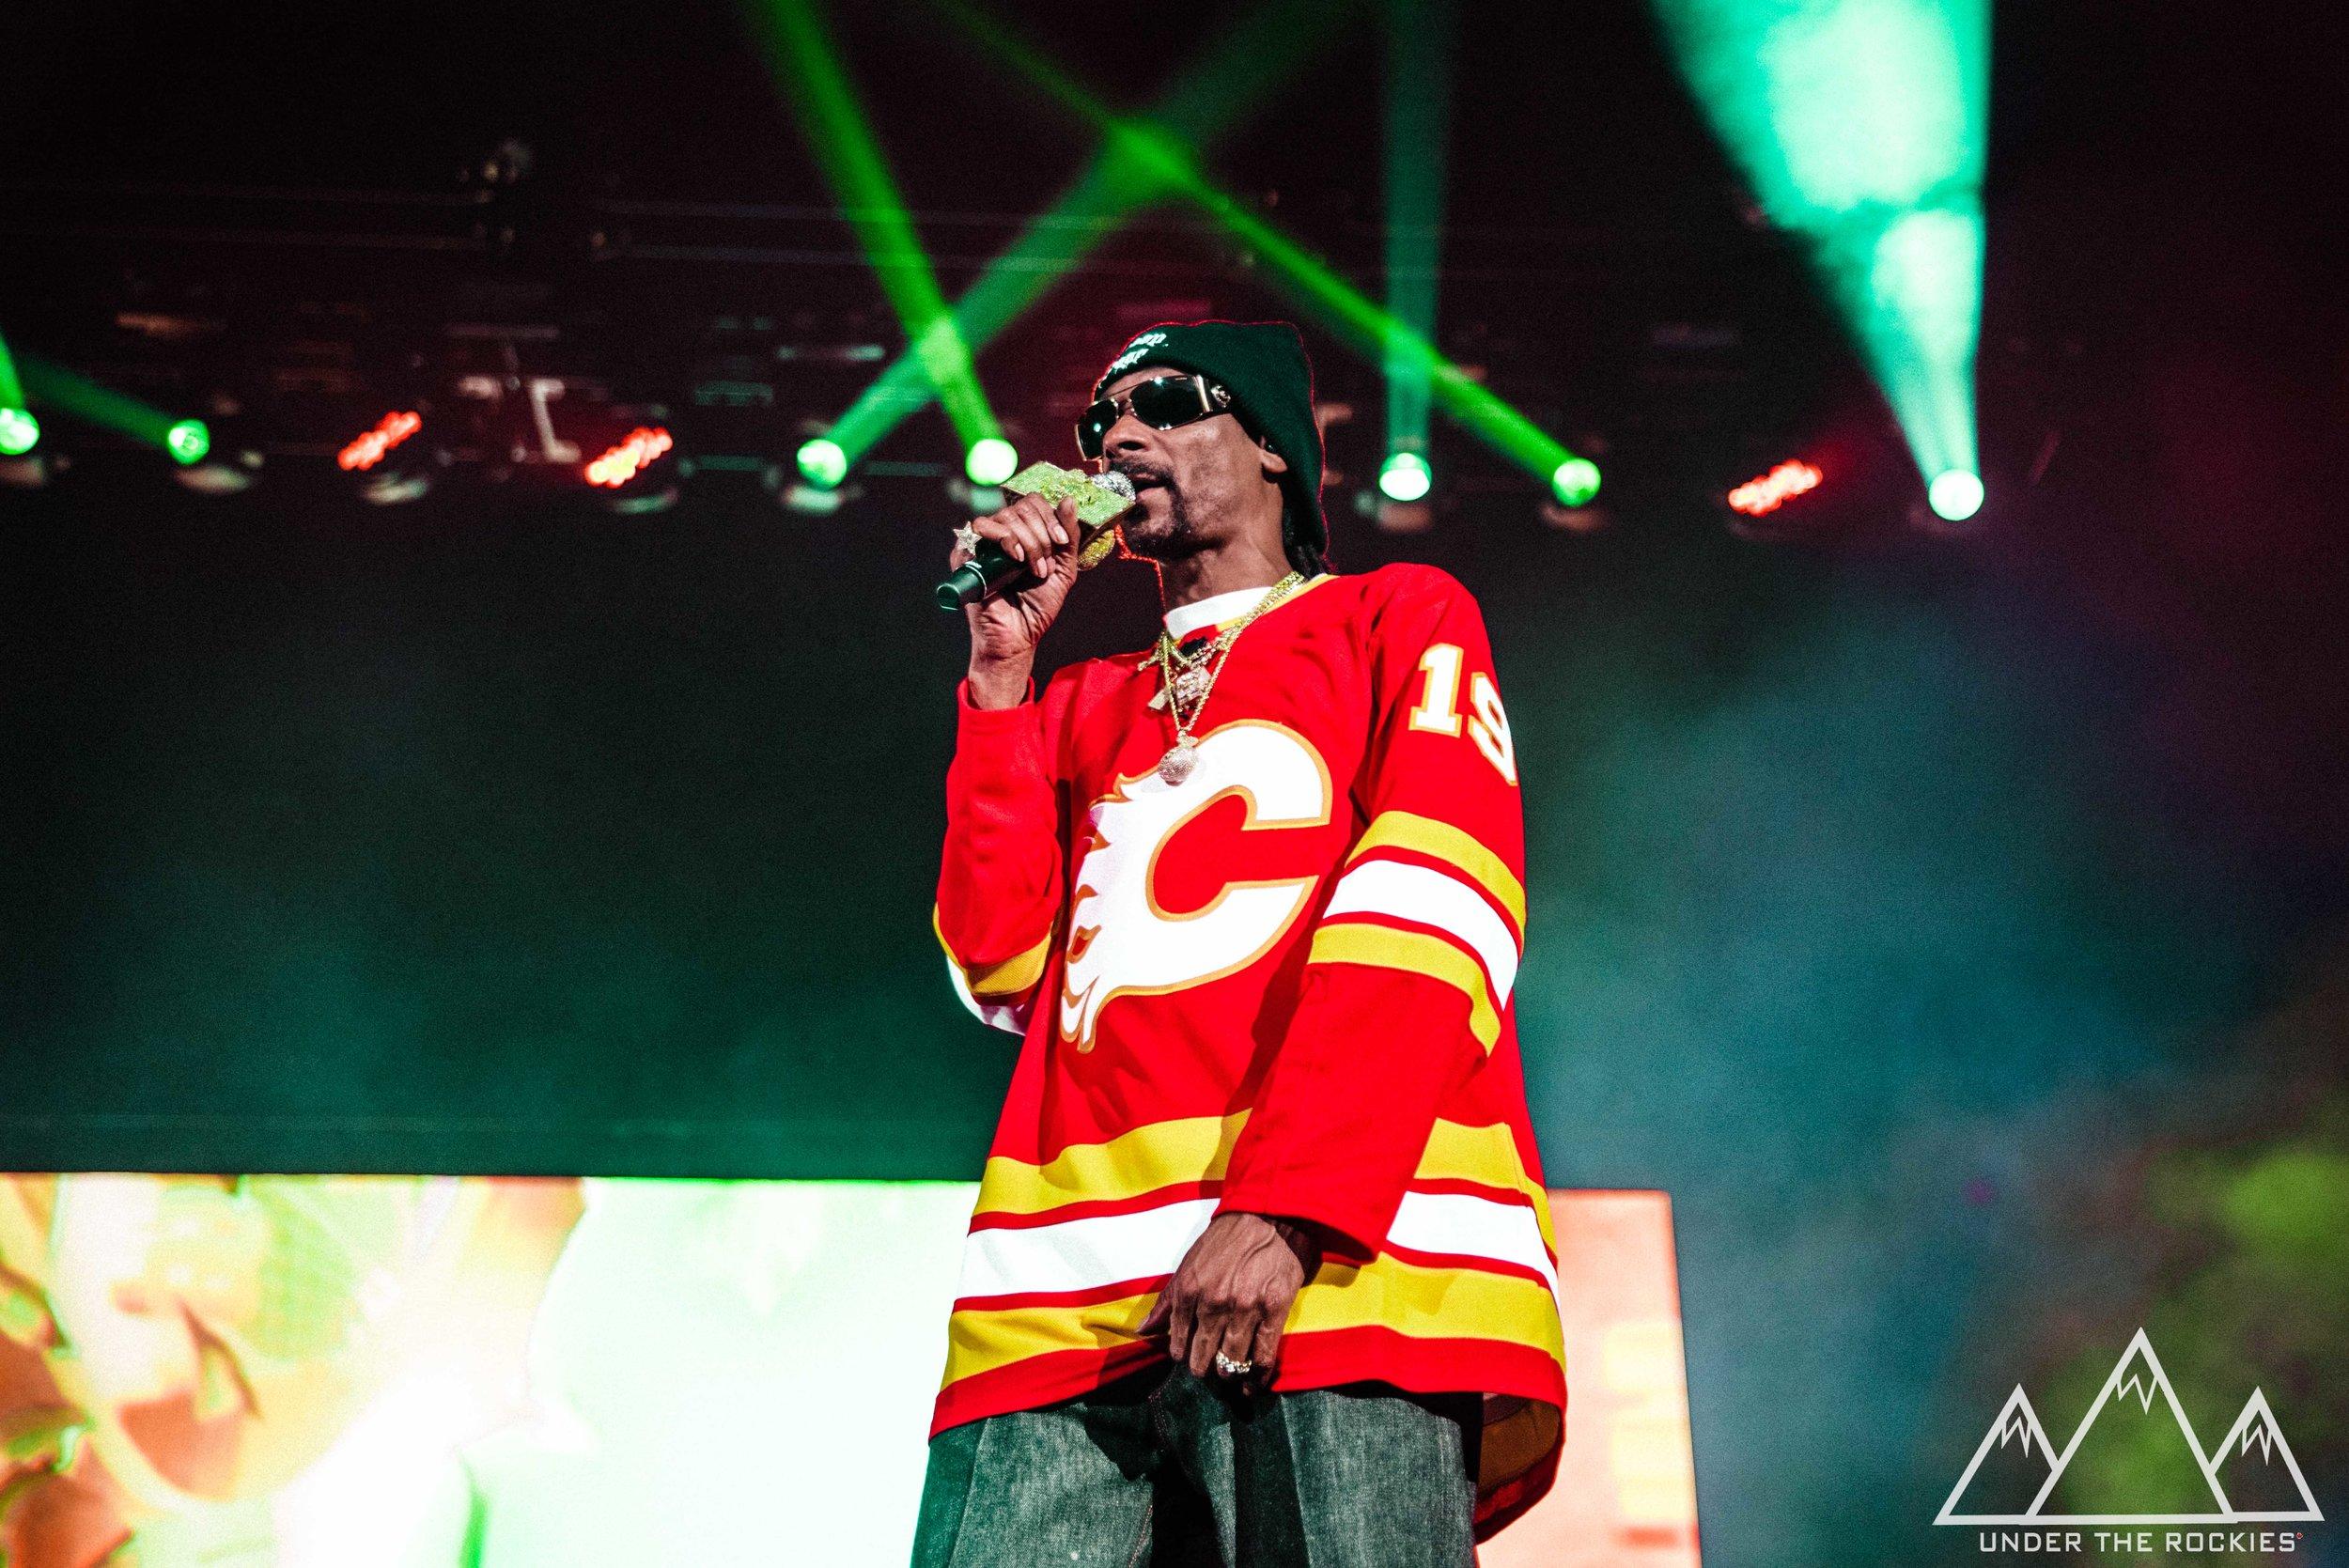 SnoopDogg-21-JJP-20190221.jpg